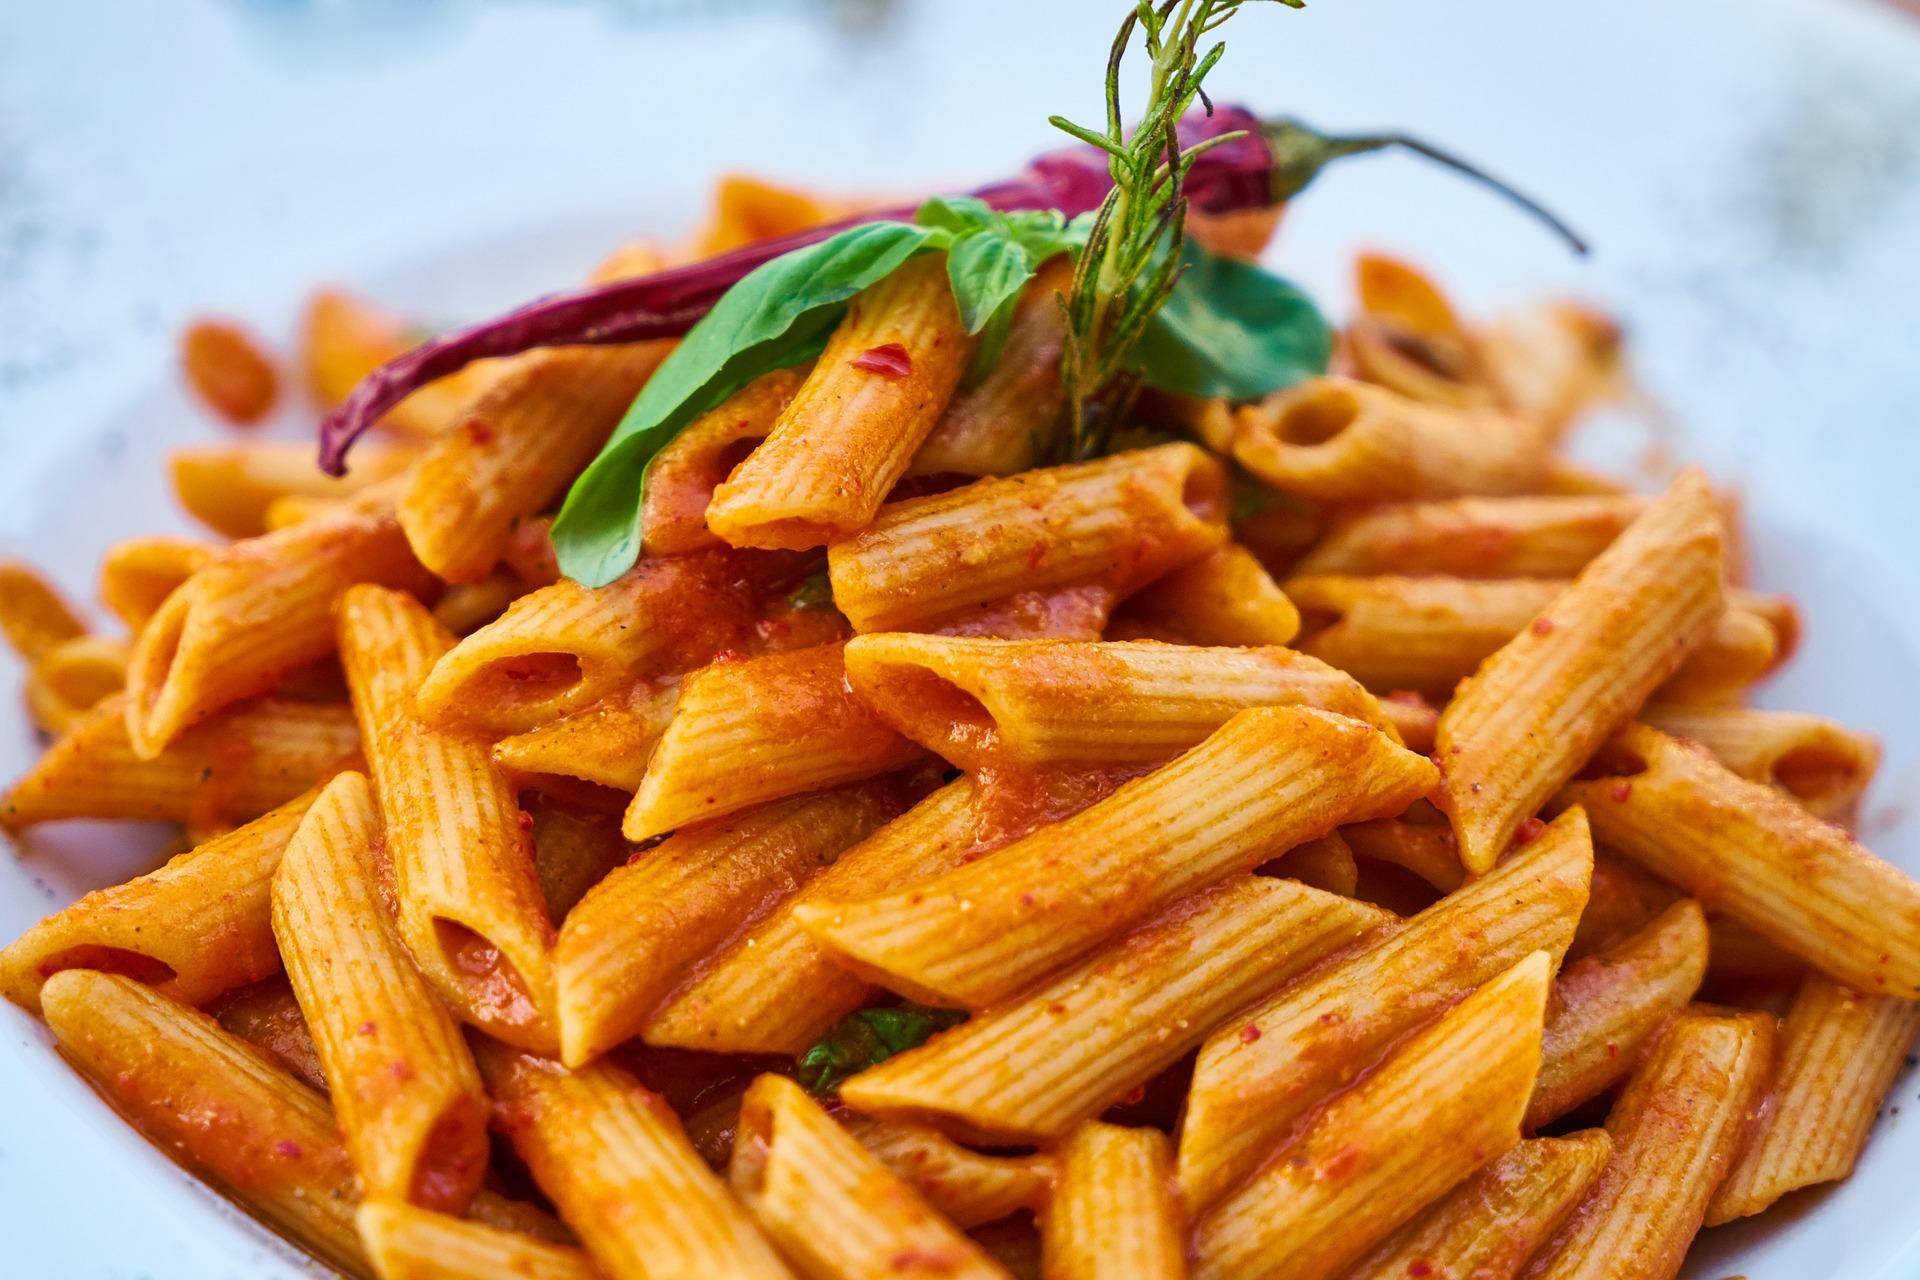 Billedresultat for italiensk mad